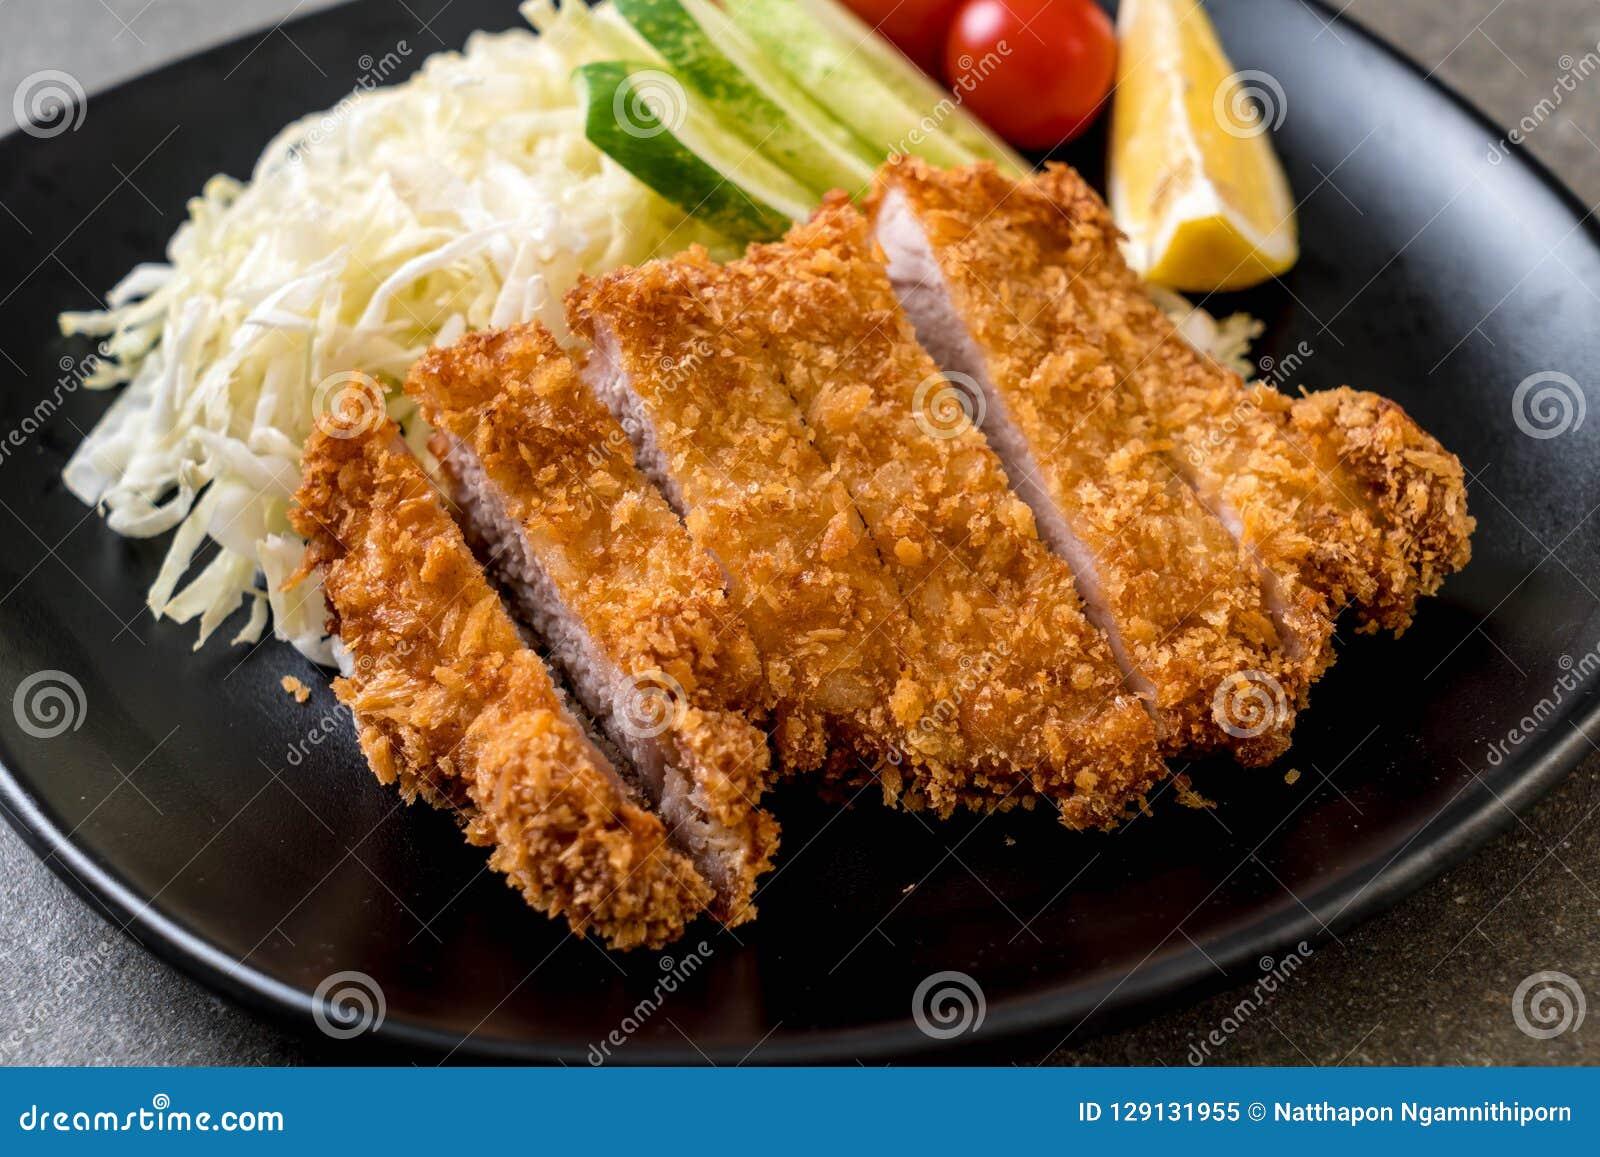 Japanese Deep Fried Pork Cutlet (tonkatsu Set) Stock Image